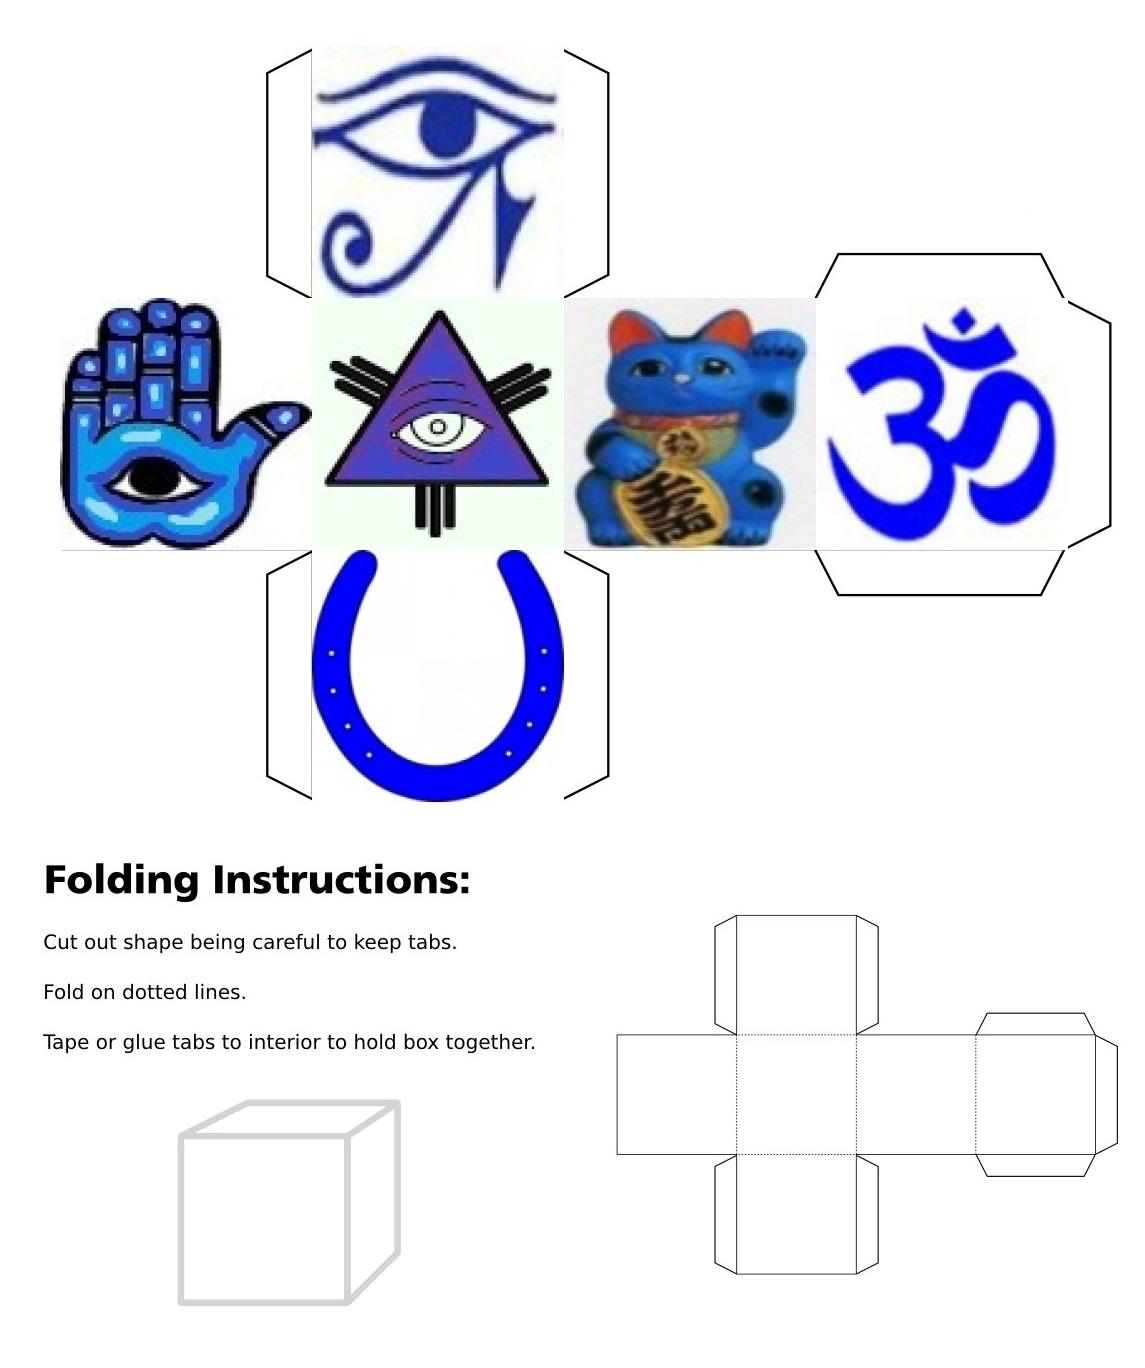 cube, 3d cube, Blue Eye of Fatima, Blue Eye of Providence, Blue Horseshoe, Blue Maneki Neko, Blue Om, Blue Eye of Horus